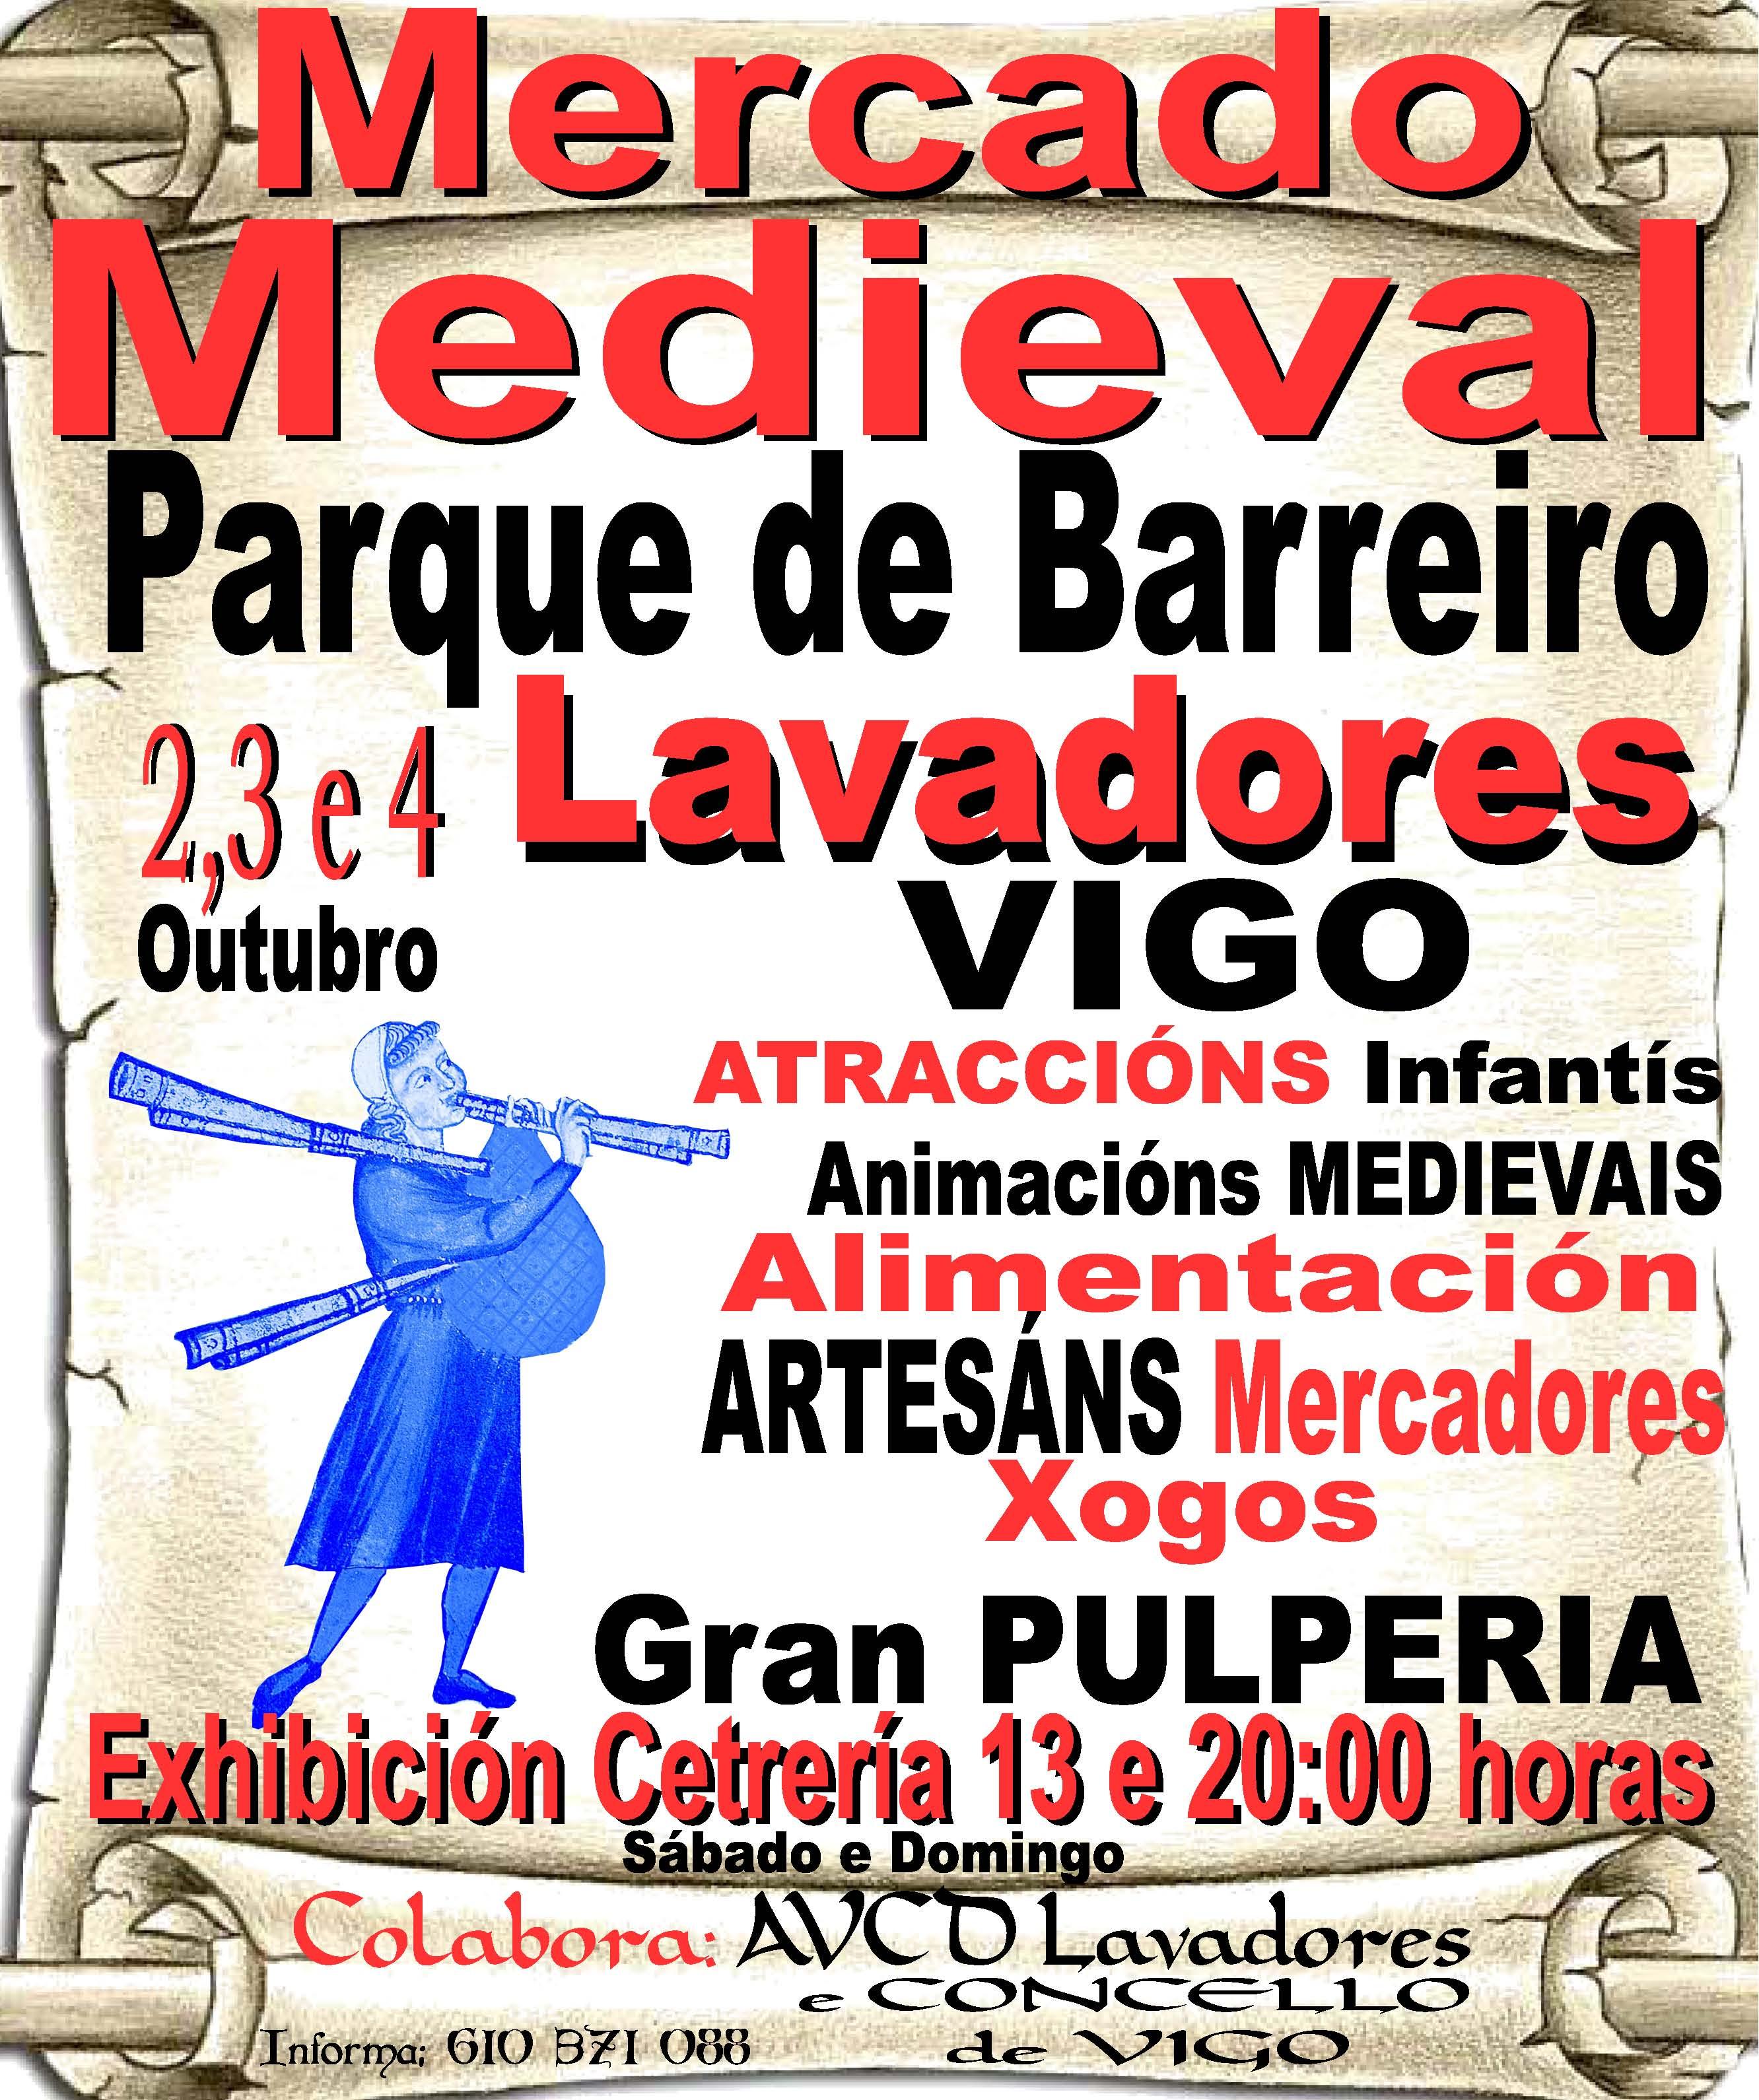 Mercado medieval de Vigo – Lavadores